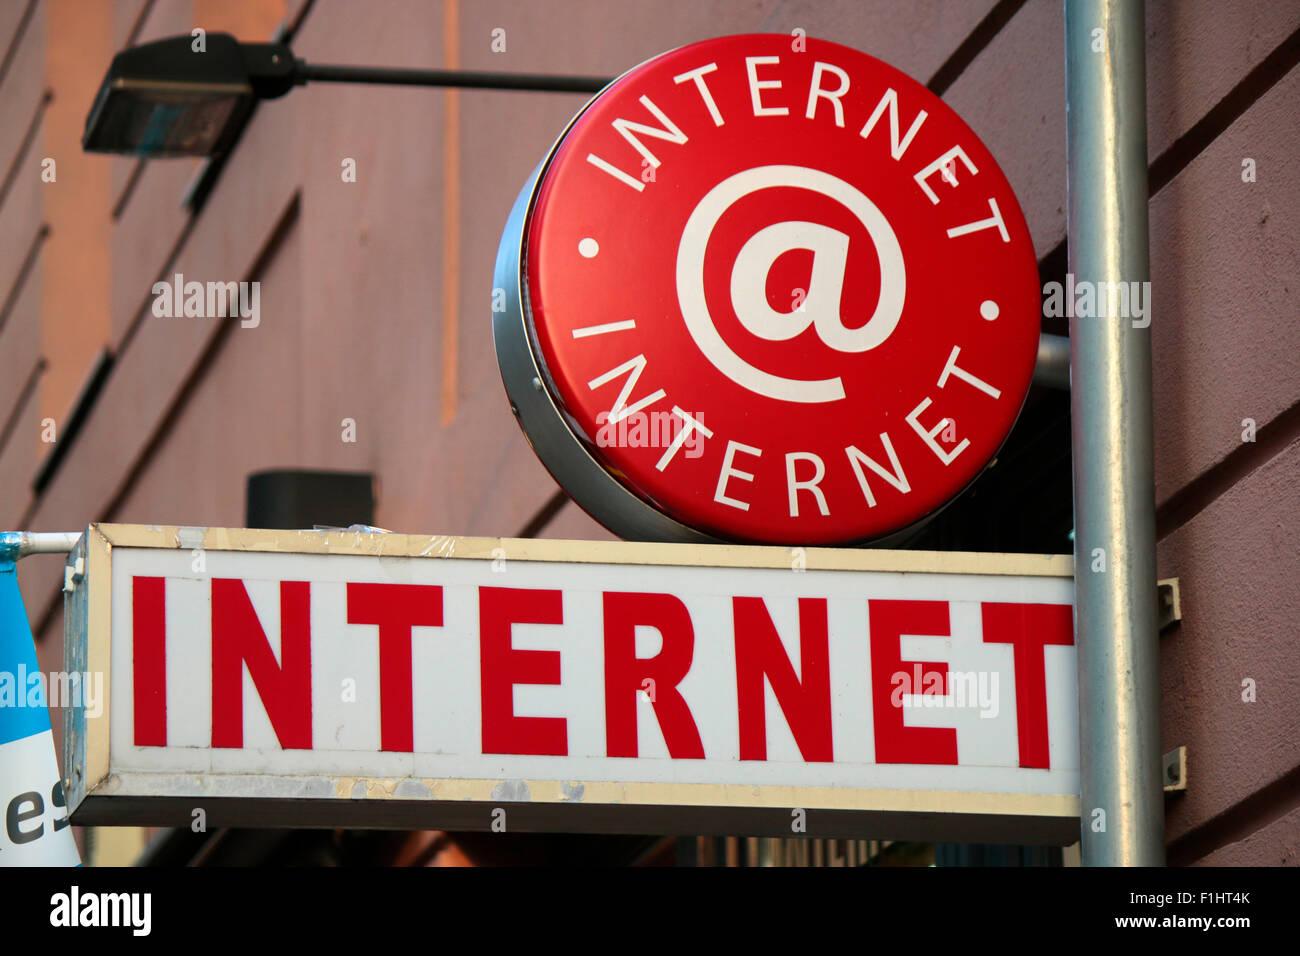 Markennamen: 'Internet', Berlin. - Stock Image